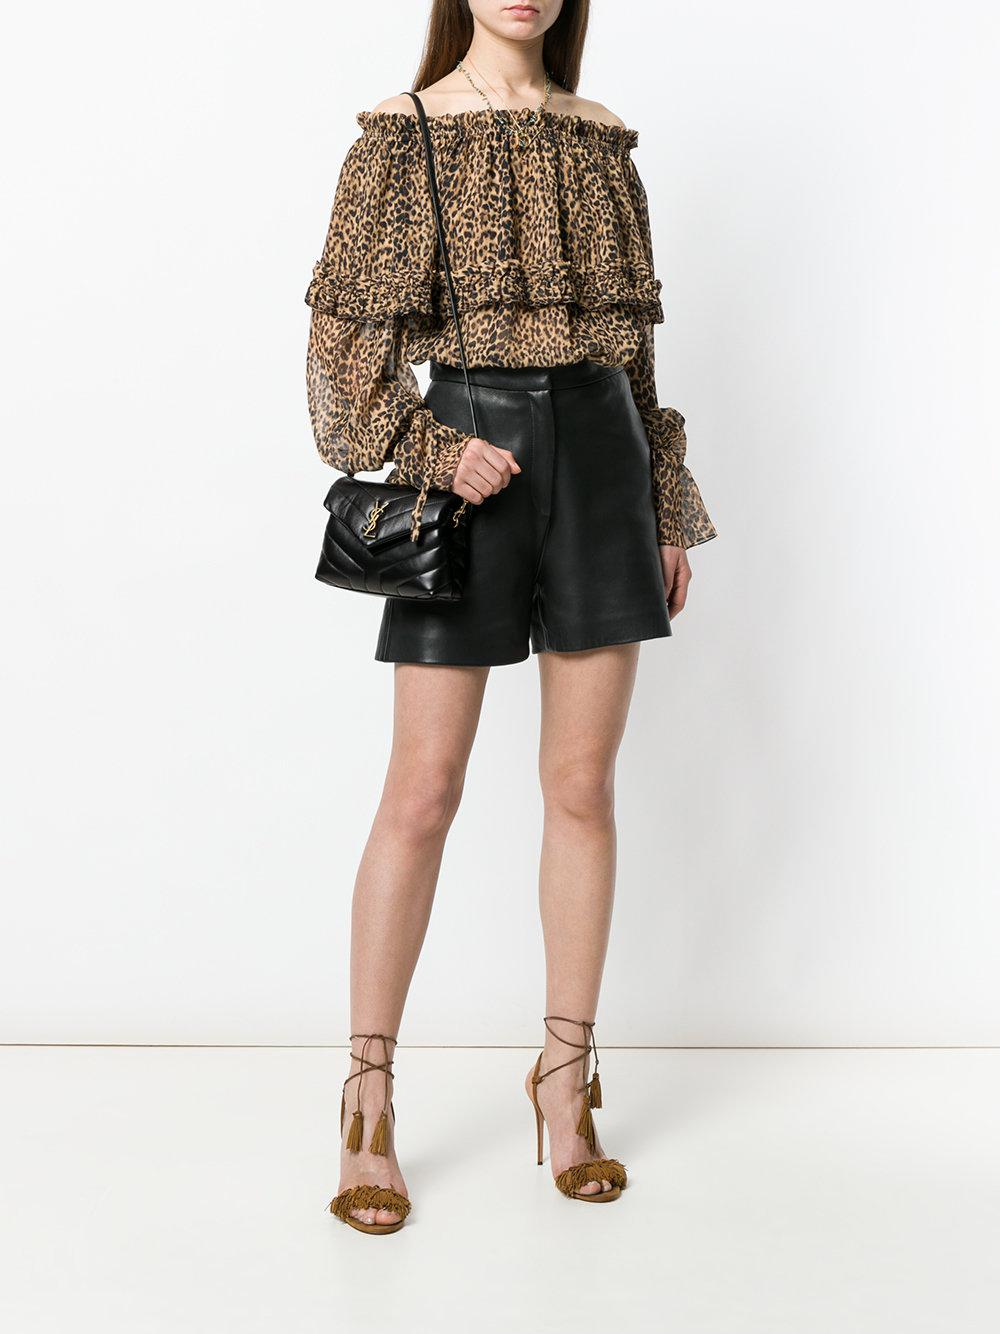 Lyst - Saint Laurent Toy Loulou Shoulder Bag in Black - Save 12% f6214f8775540